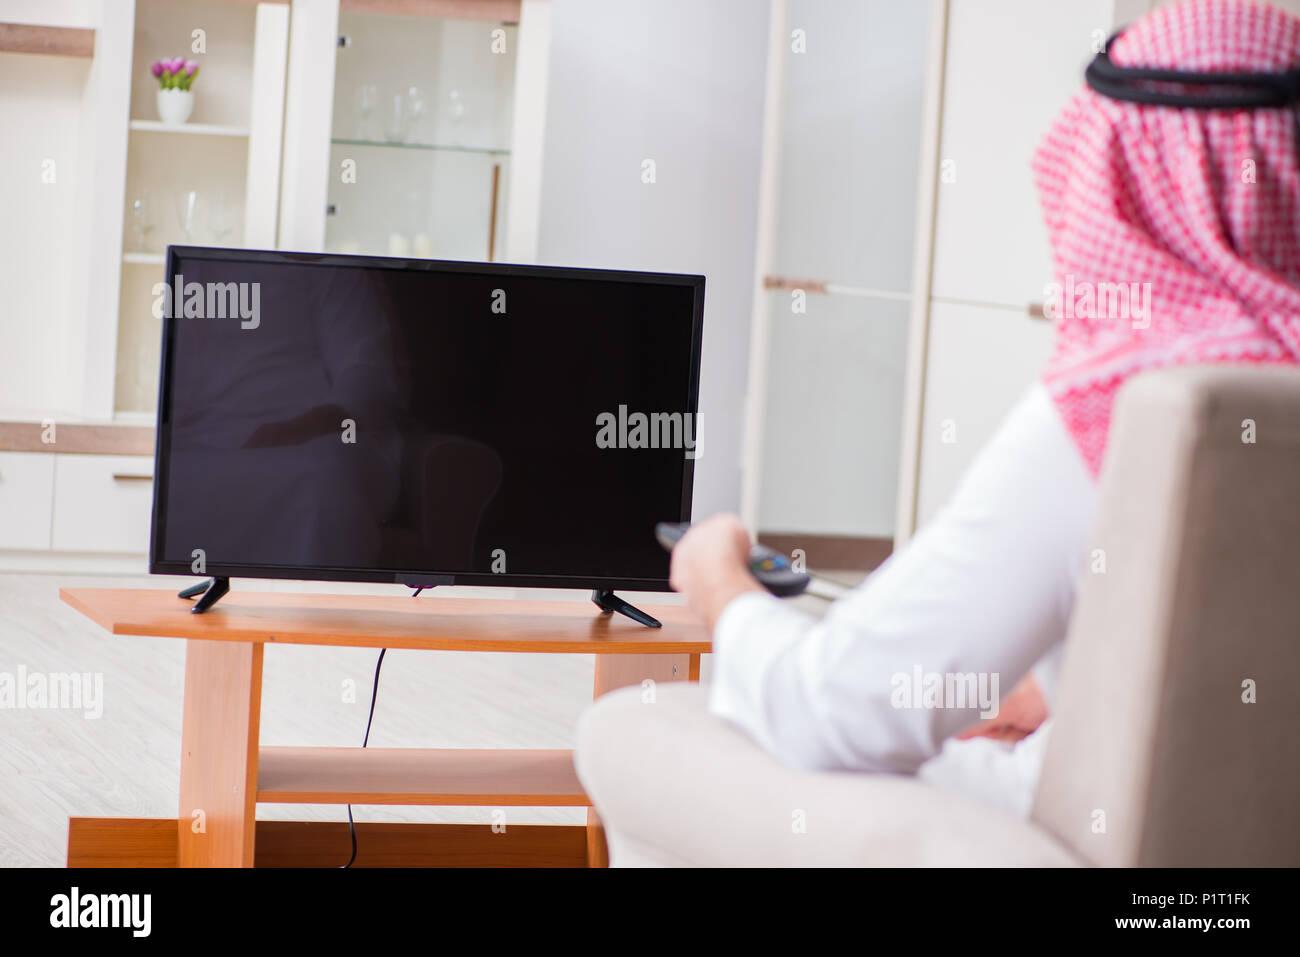 Living Room Saudi Arabian Stock Photos & Living Room Saudi Arabian ...